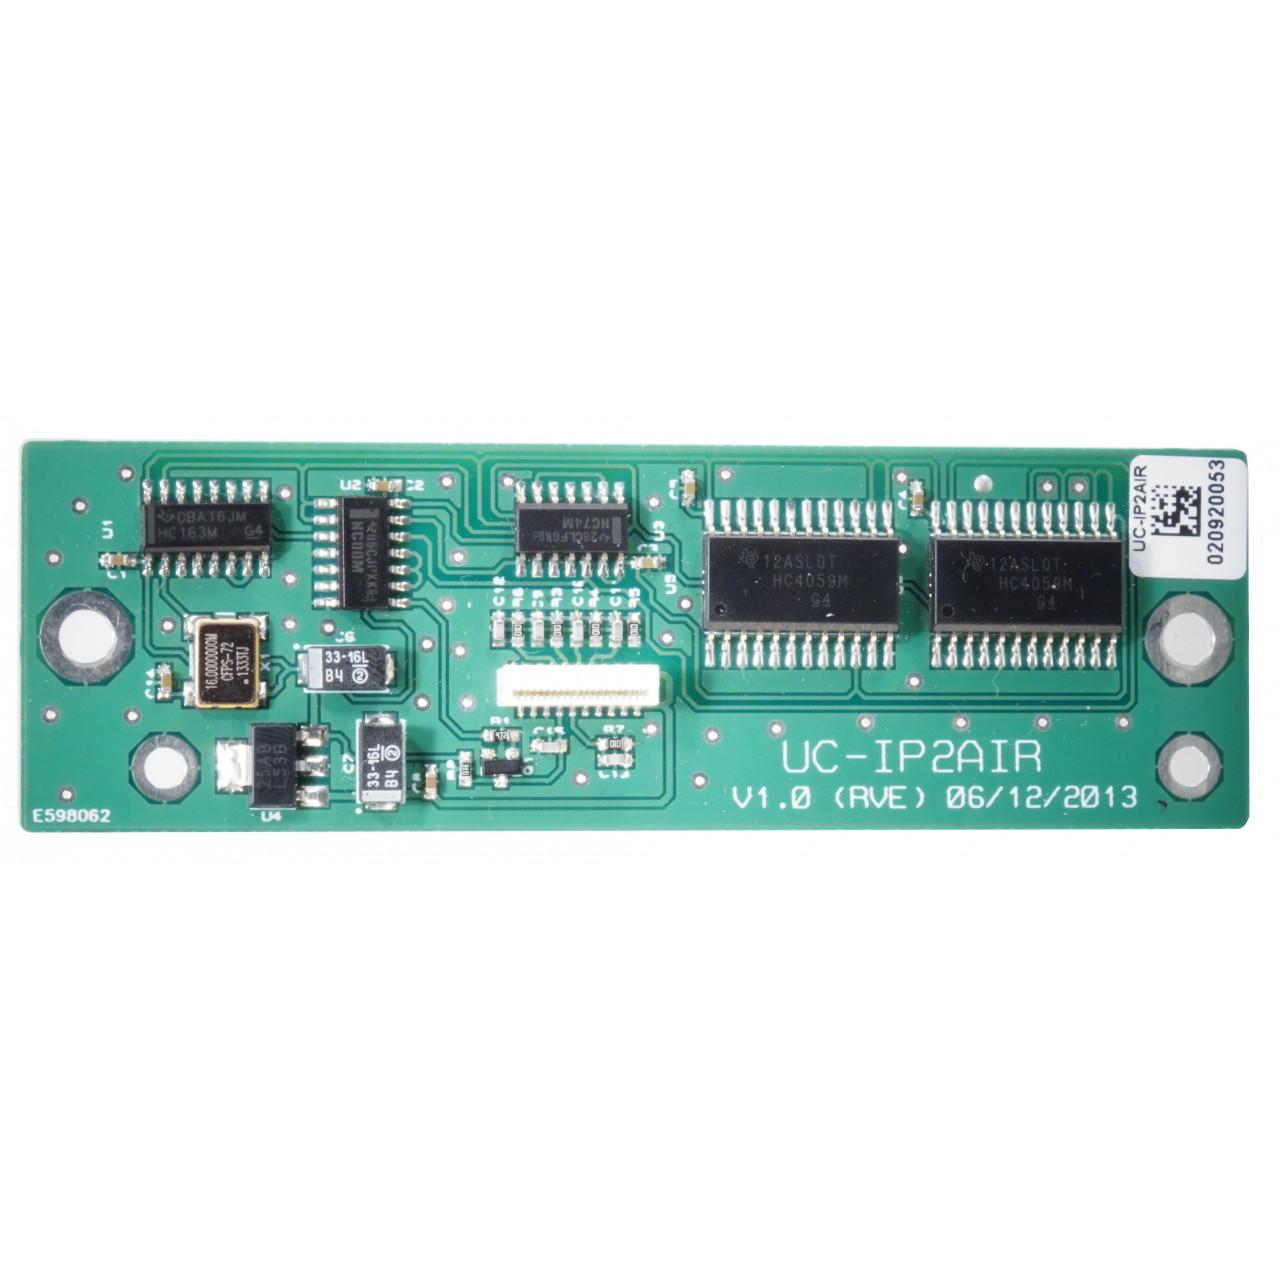 UC-IP2AIR Adaptateurs - ICOM